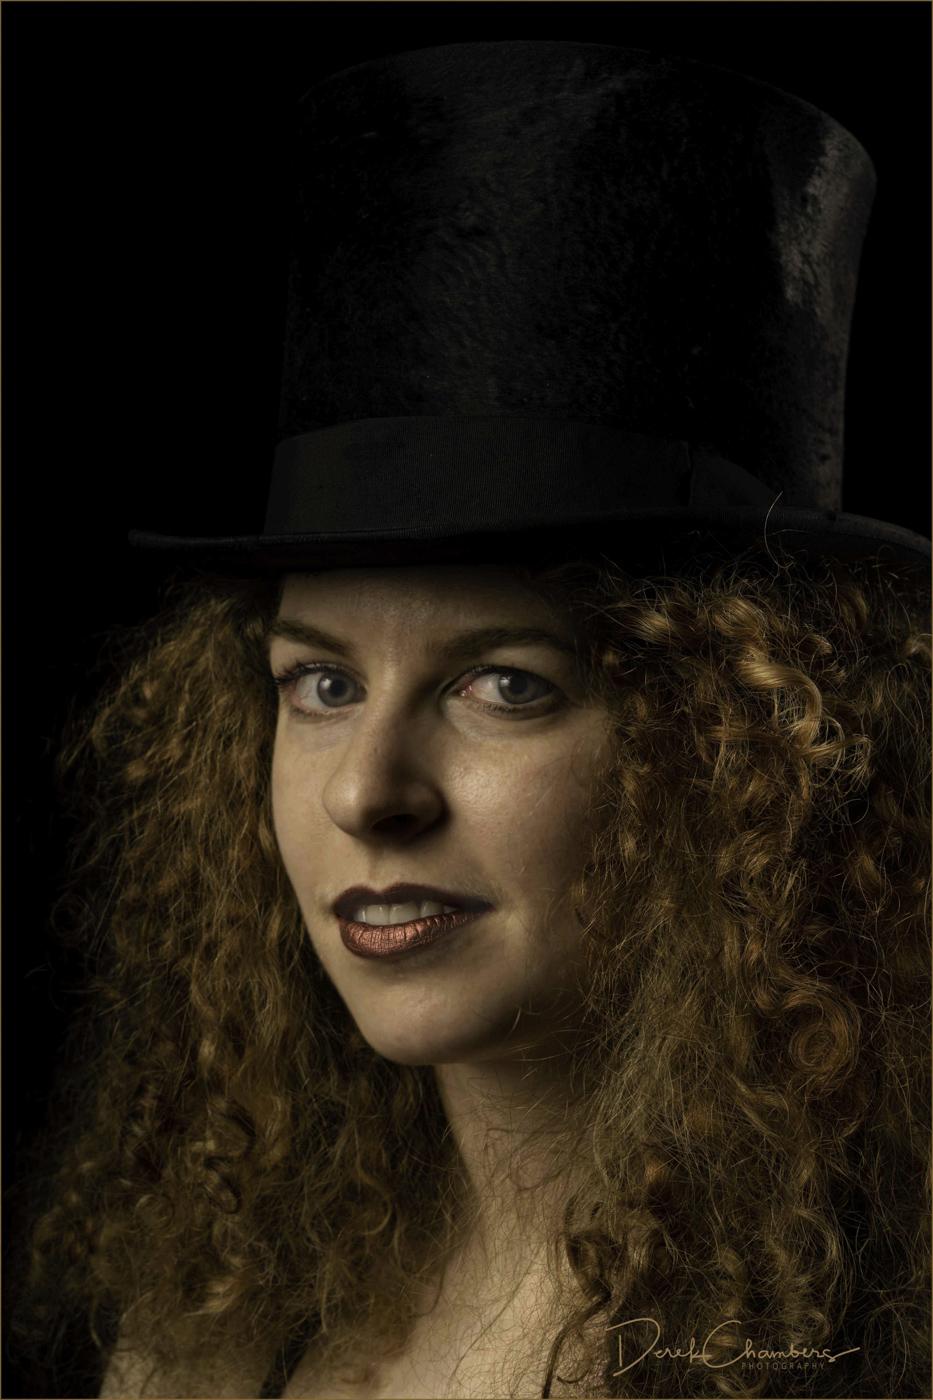 Top Hat Girl - Derek Chambers